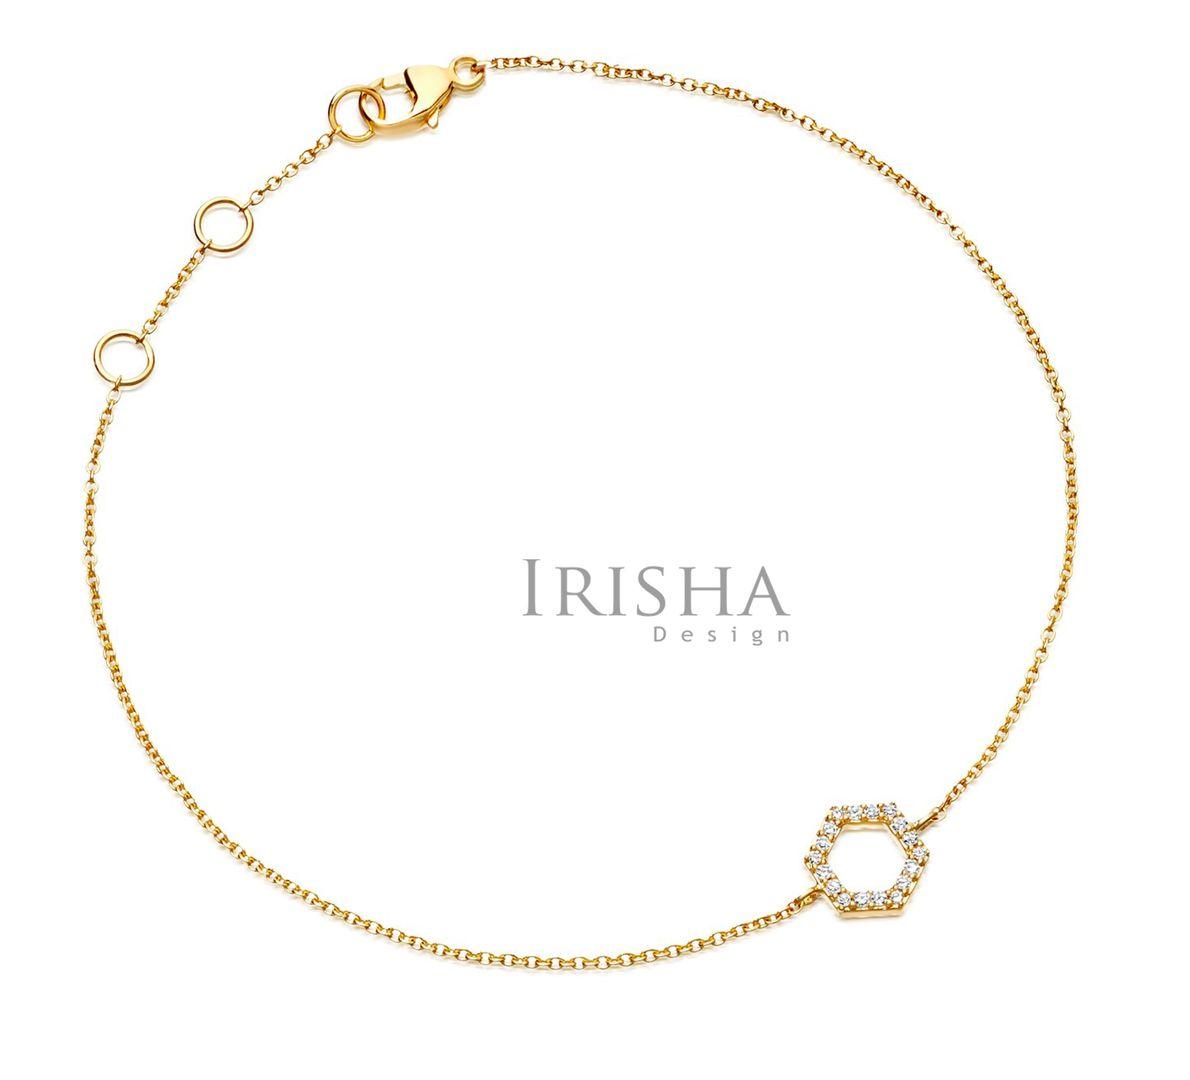 0.09 Ct. Genuine Diamond Honeycomb Charm Chain Bracelet 14K Gold New Arrival